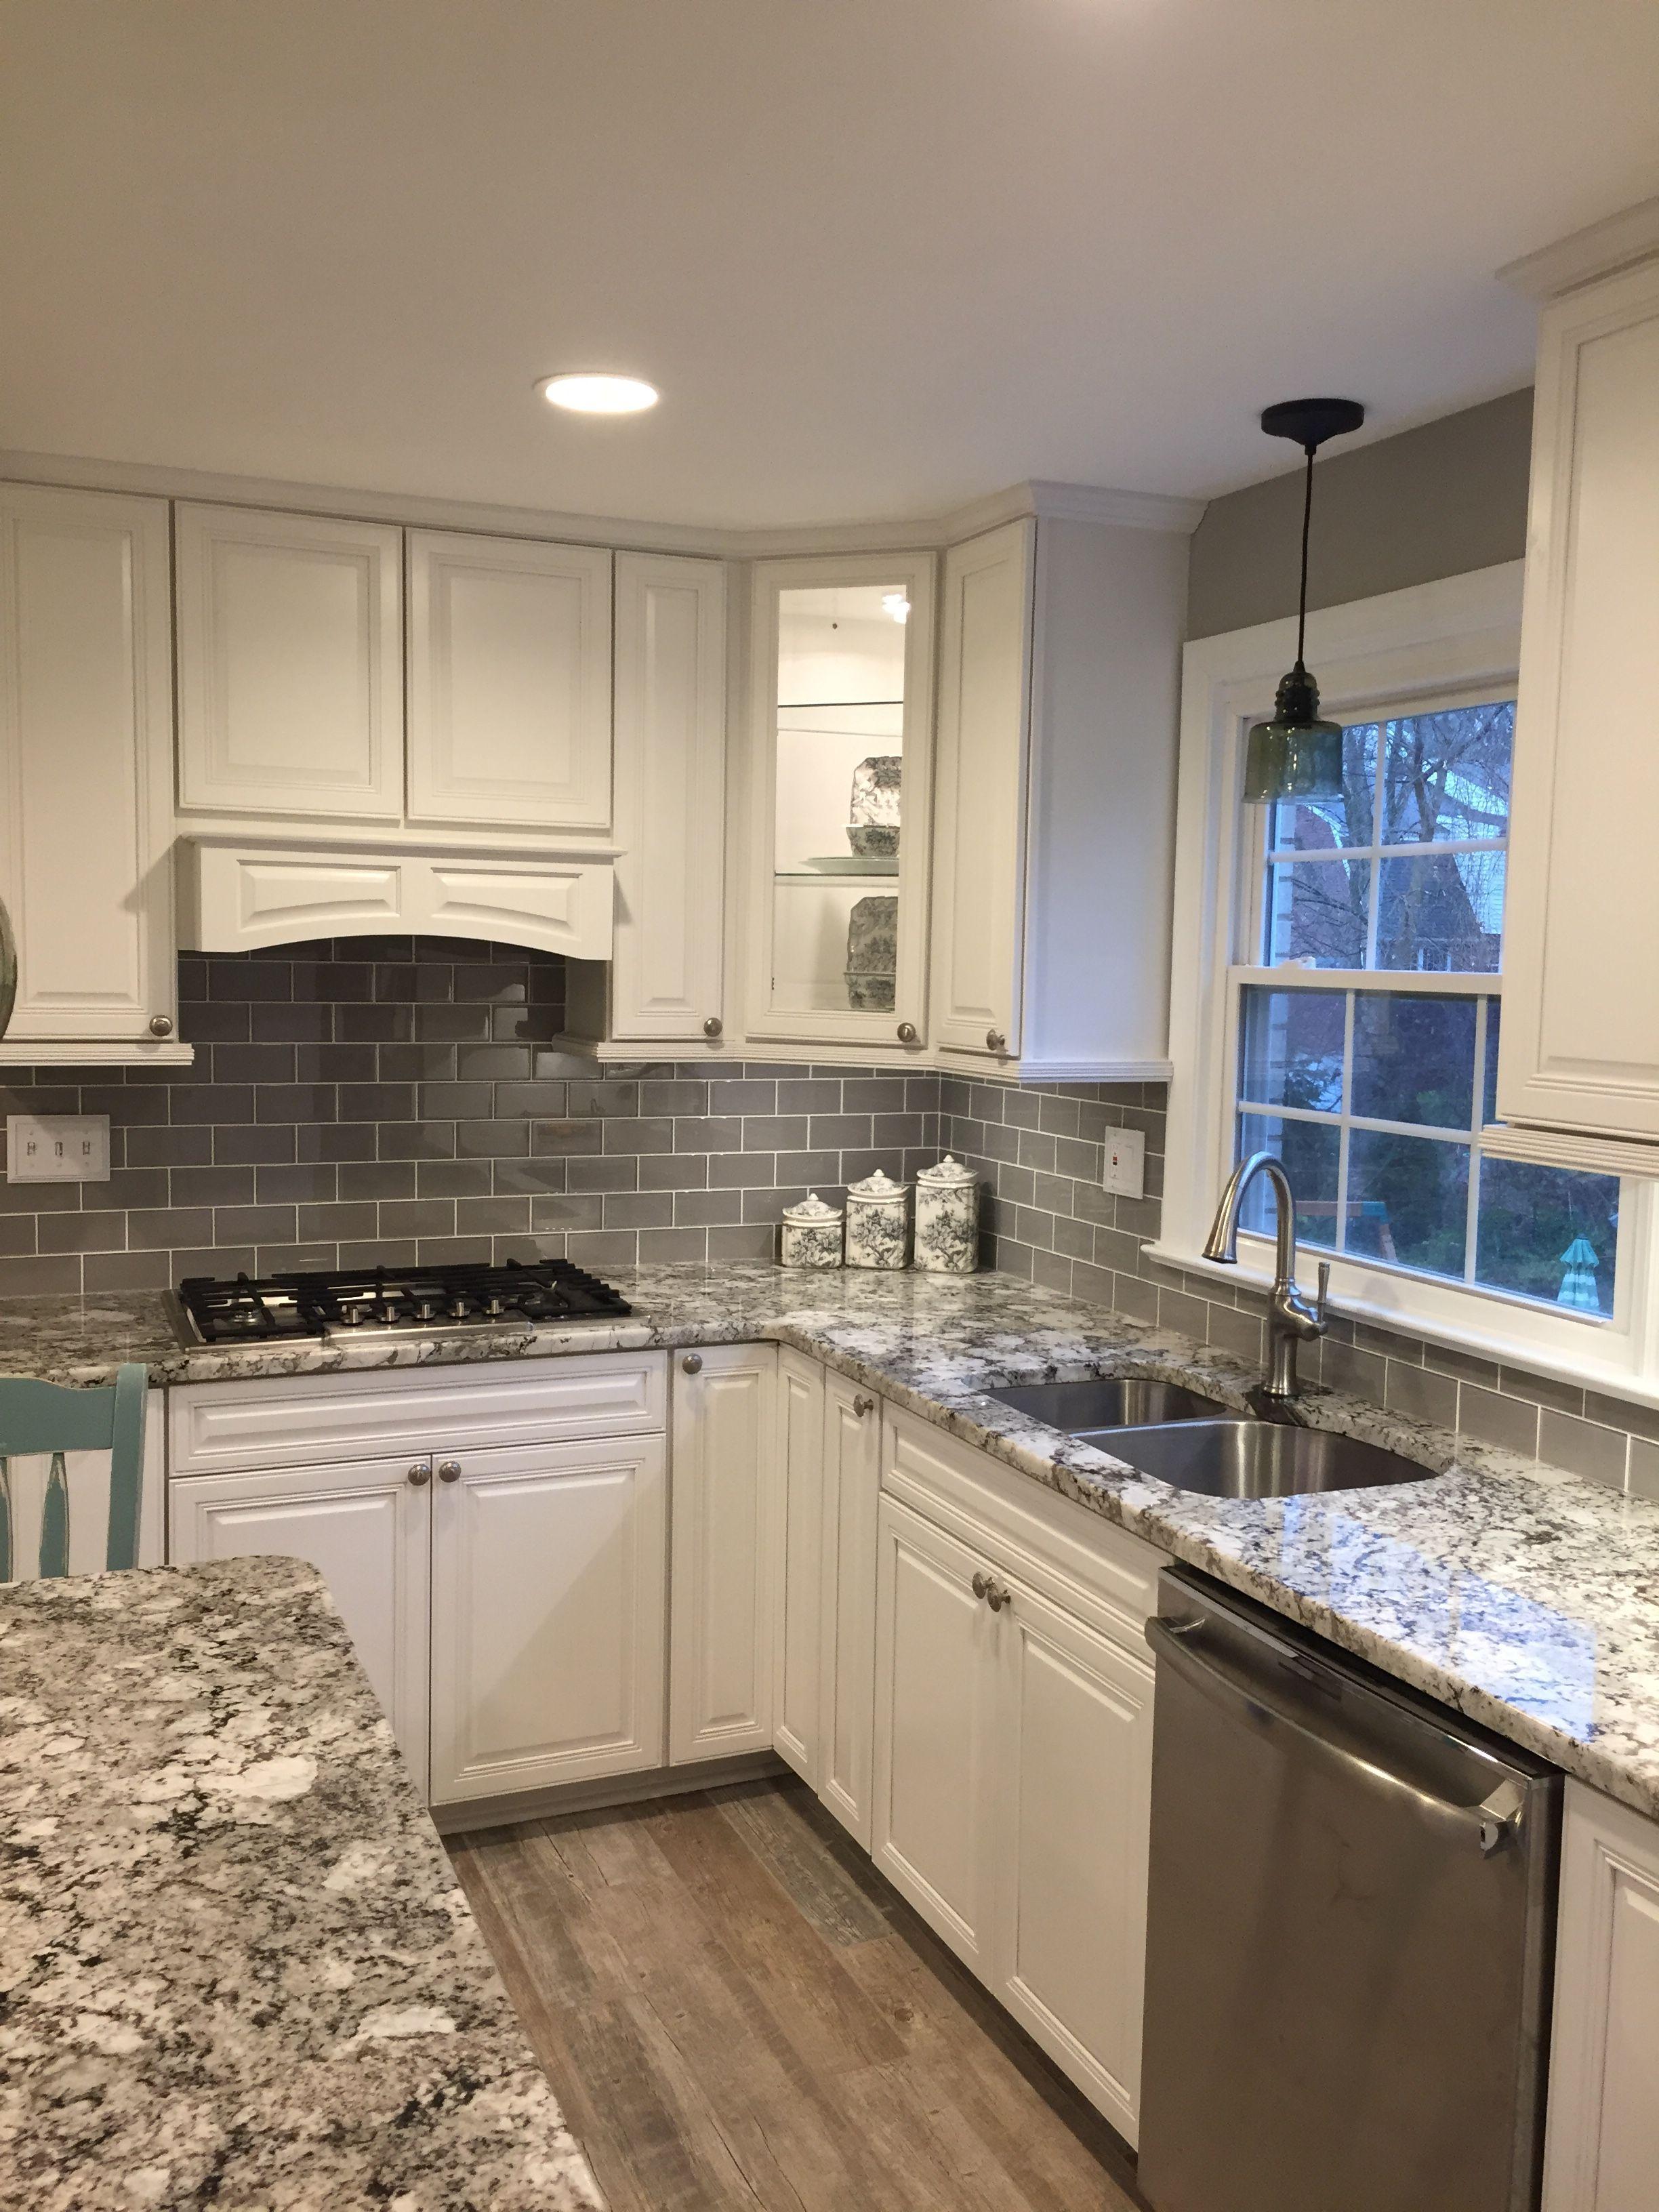 7 Creative Subway Tile Backsplash Ideas For Your Kitchen Kitchen